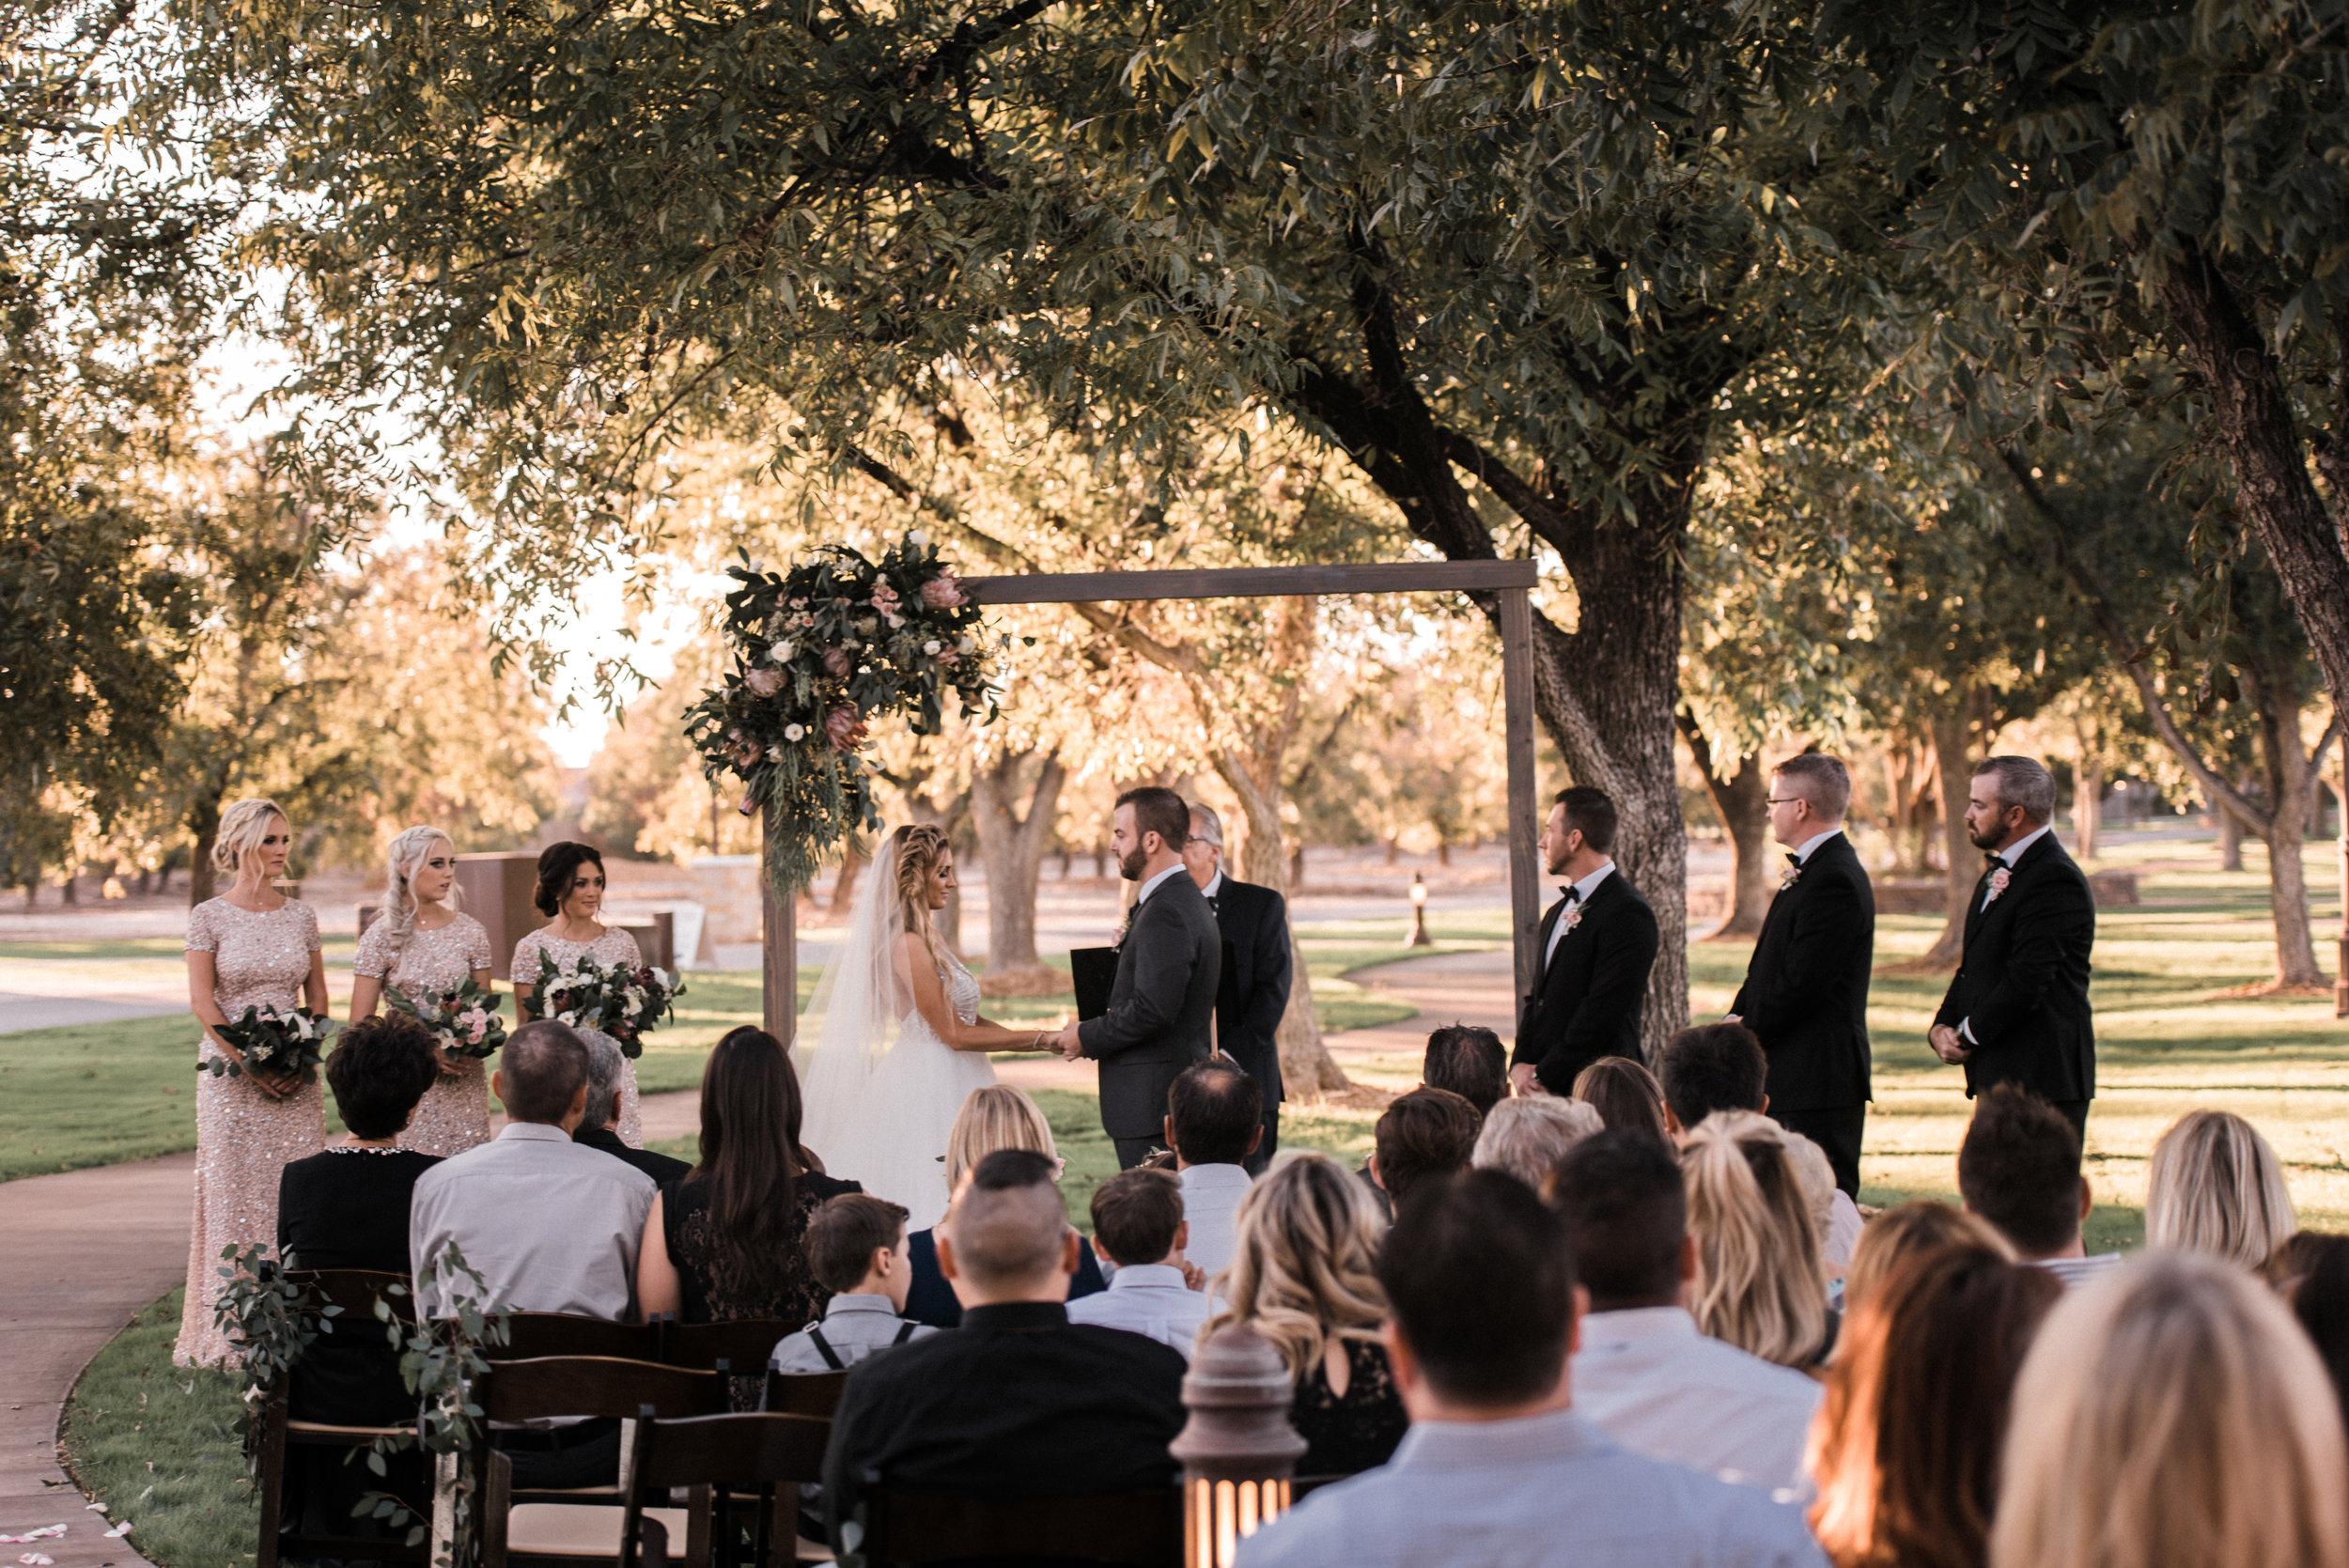 Moody, Romantic Arizona Wedding - Ceremony Inspiration